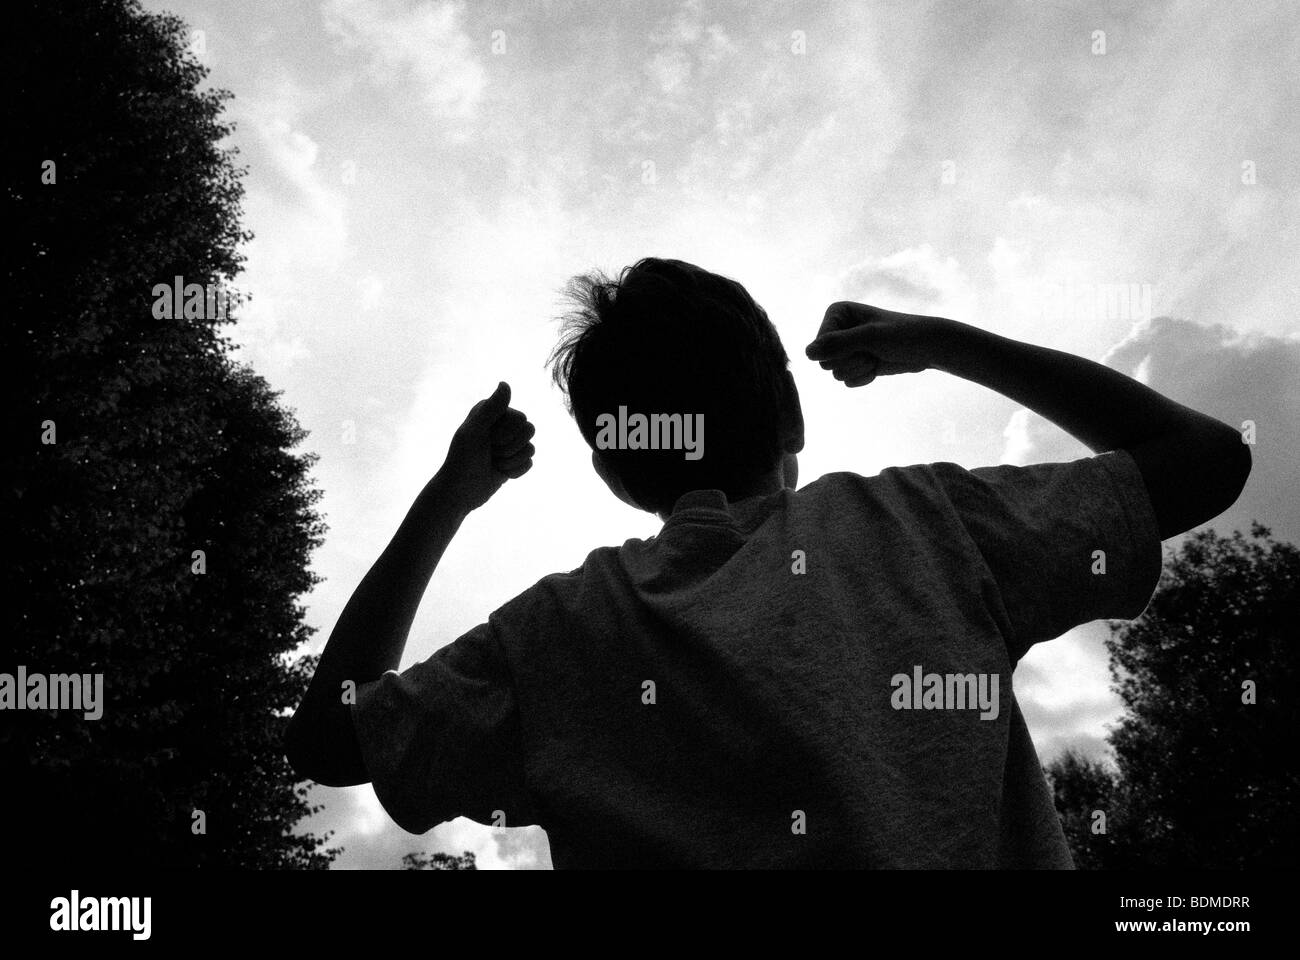 BOY CHEERING - Stock Image